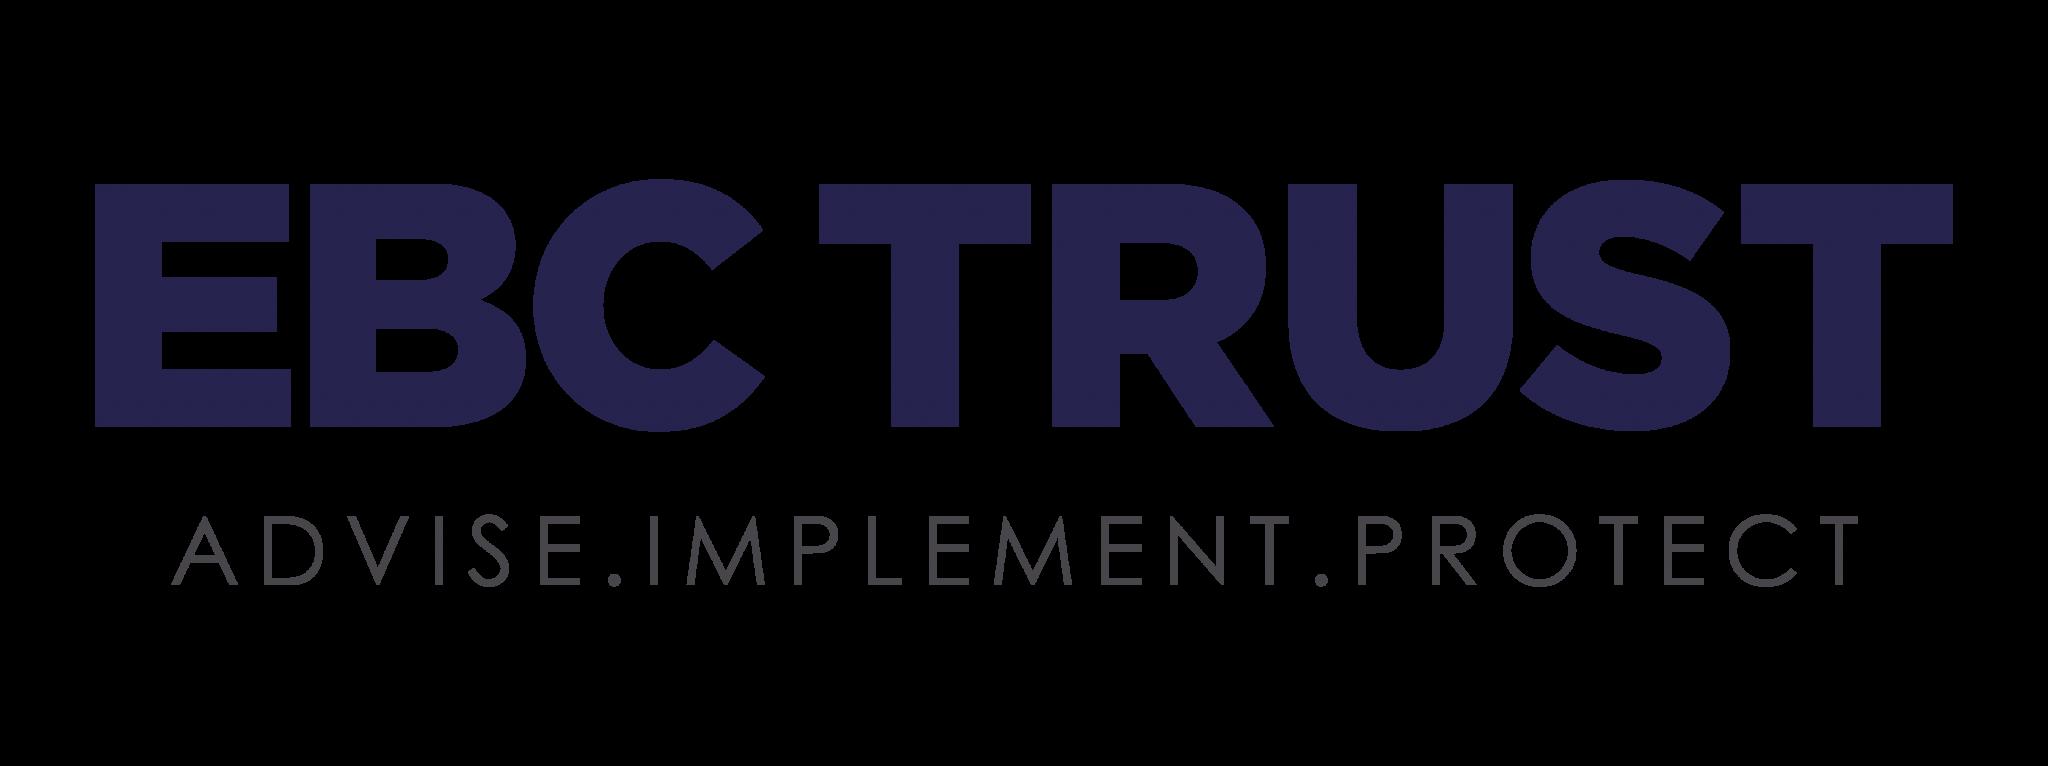 Offshore Company Formation - EBC Trust